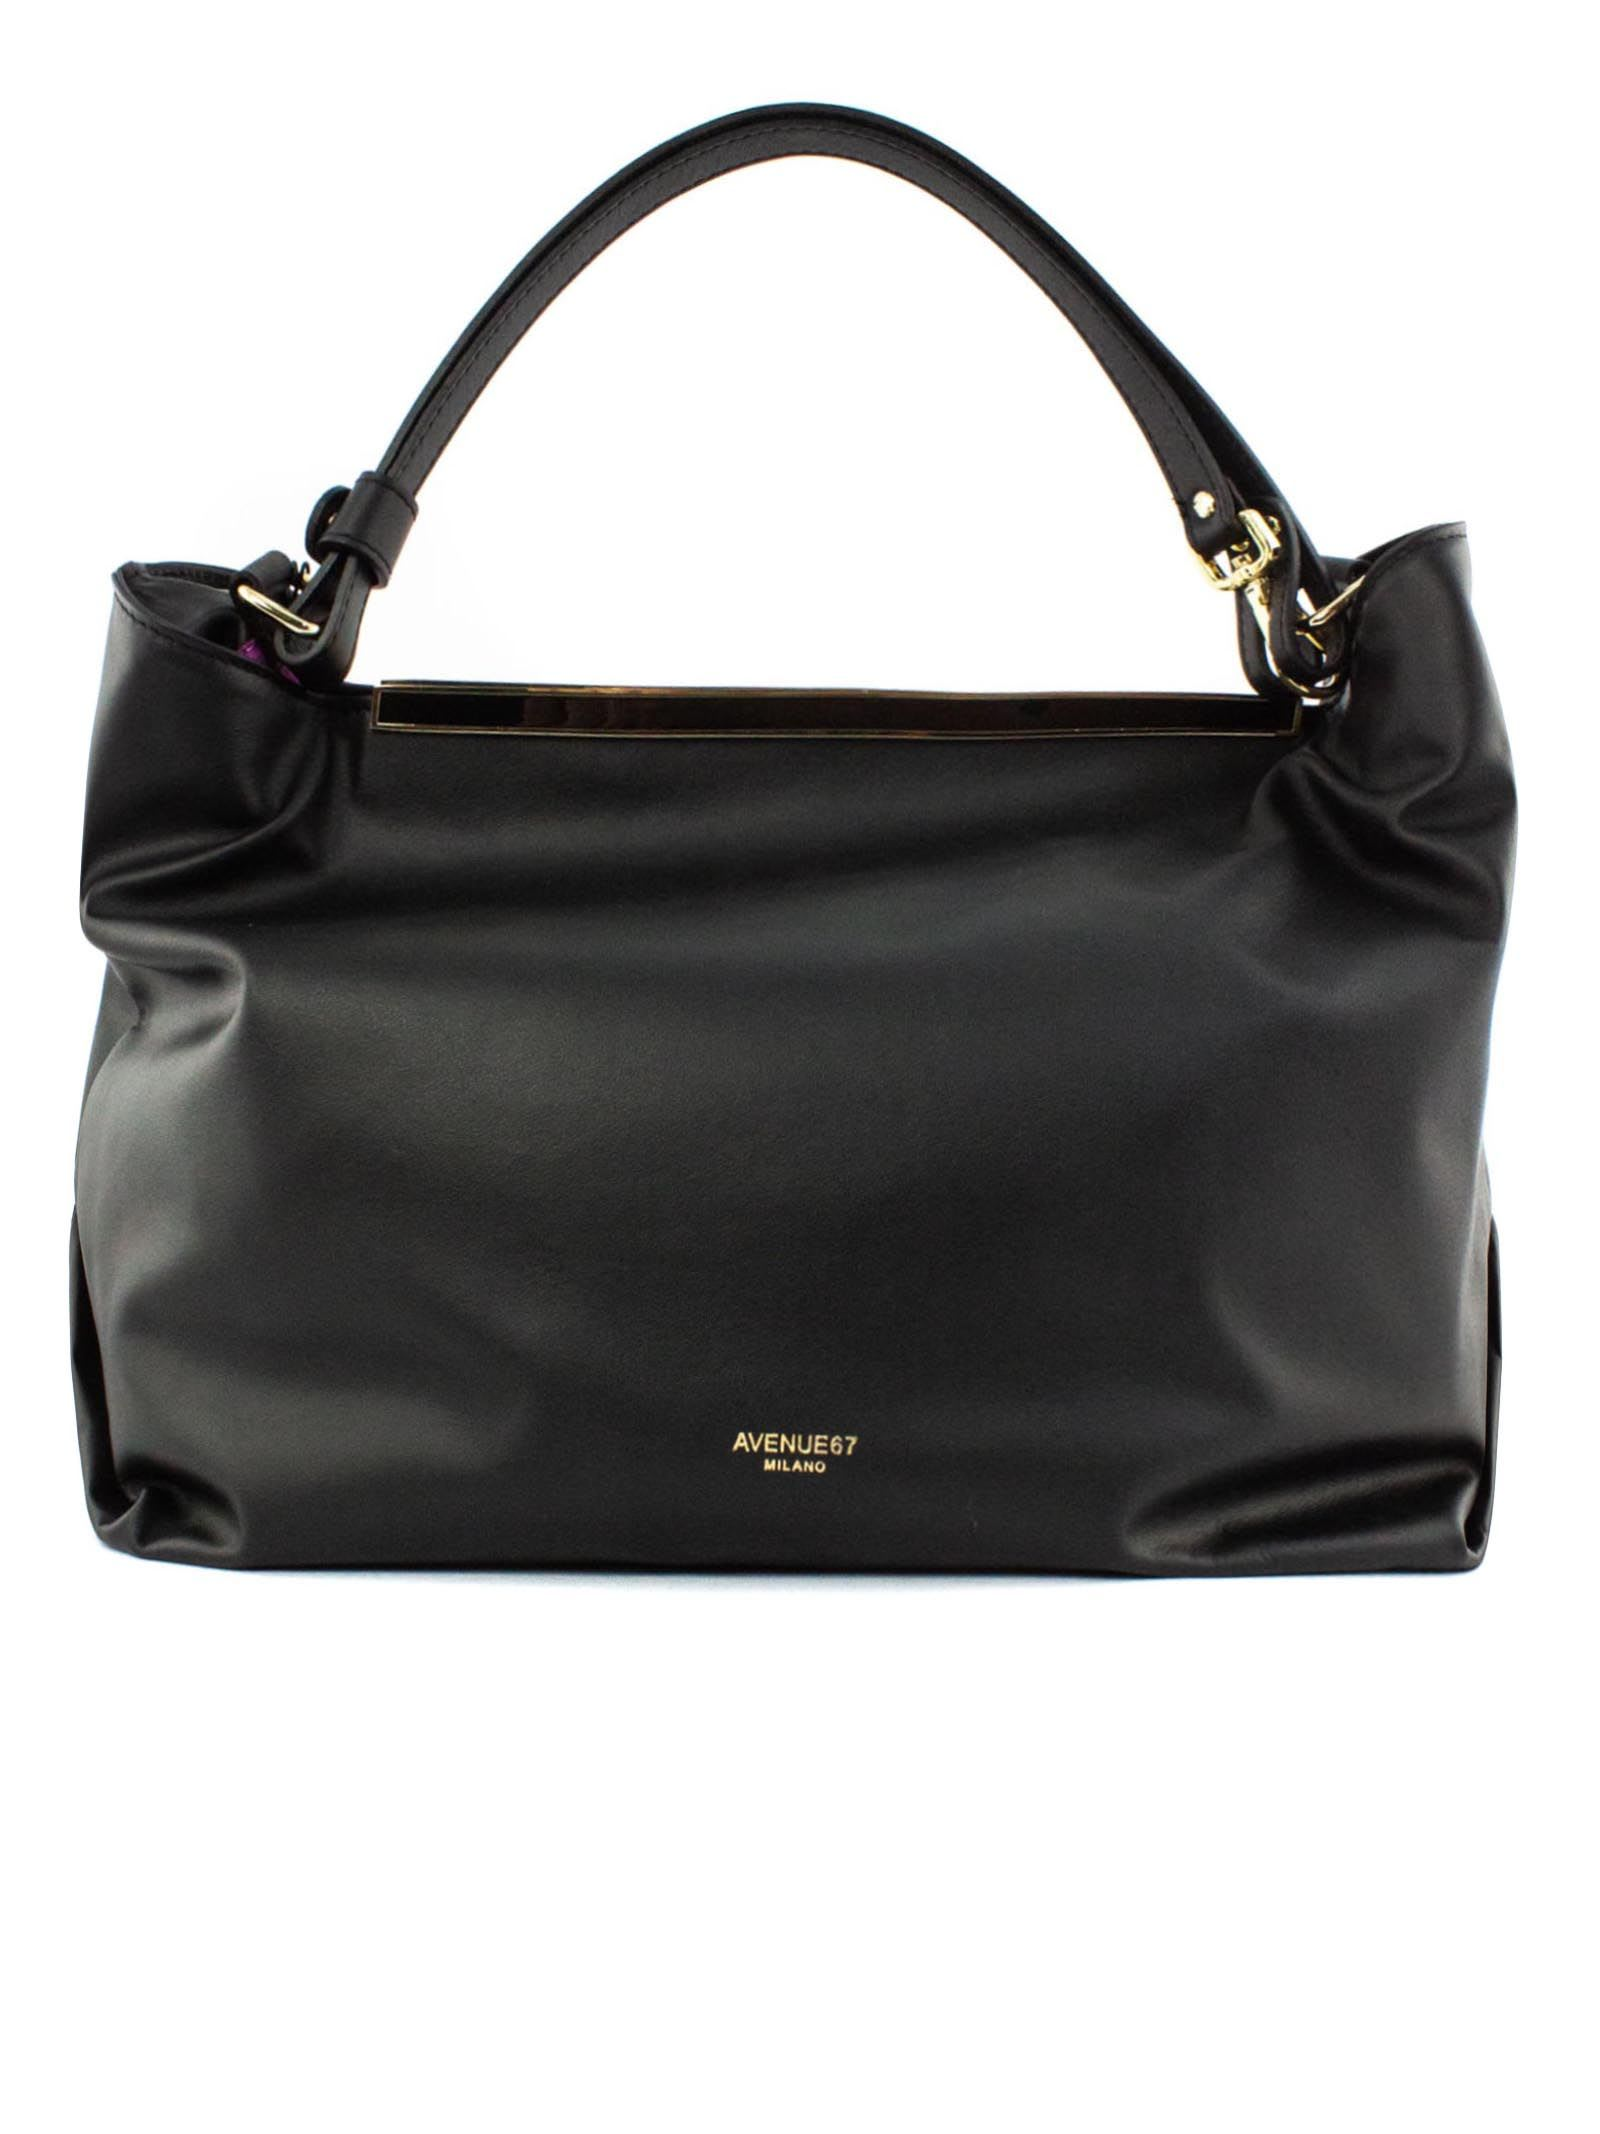 India Shopper In Black Leather